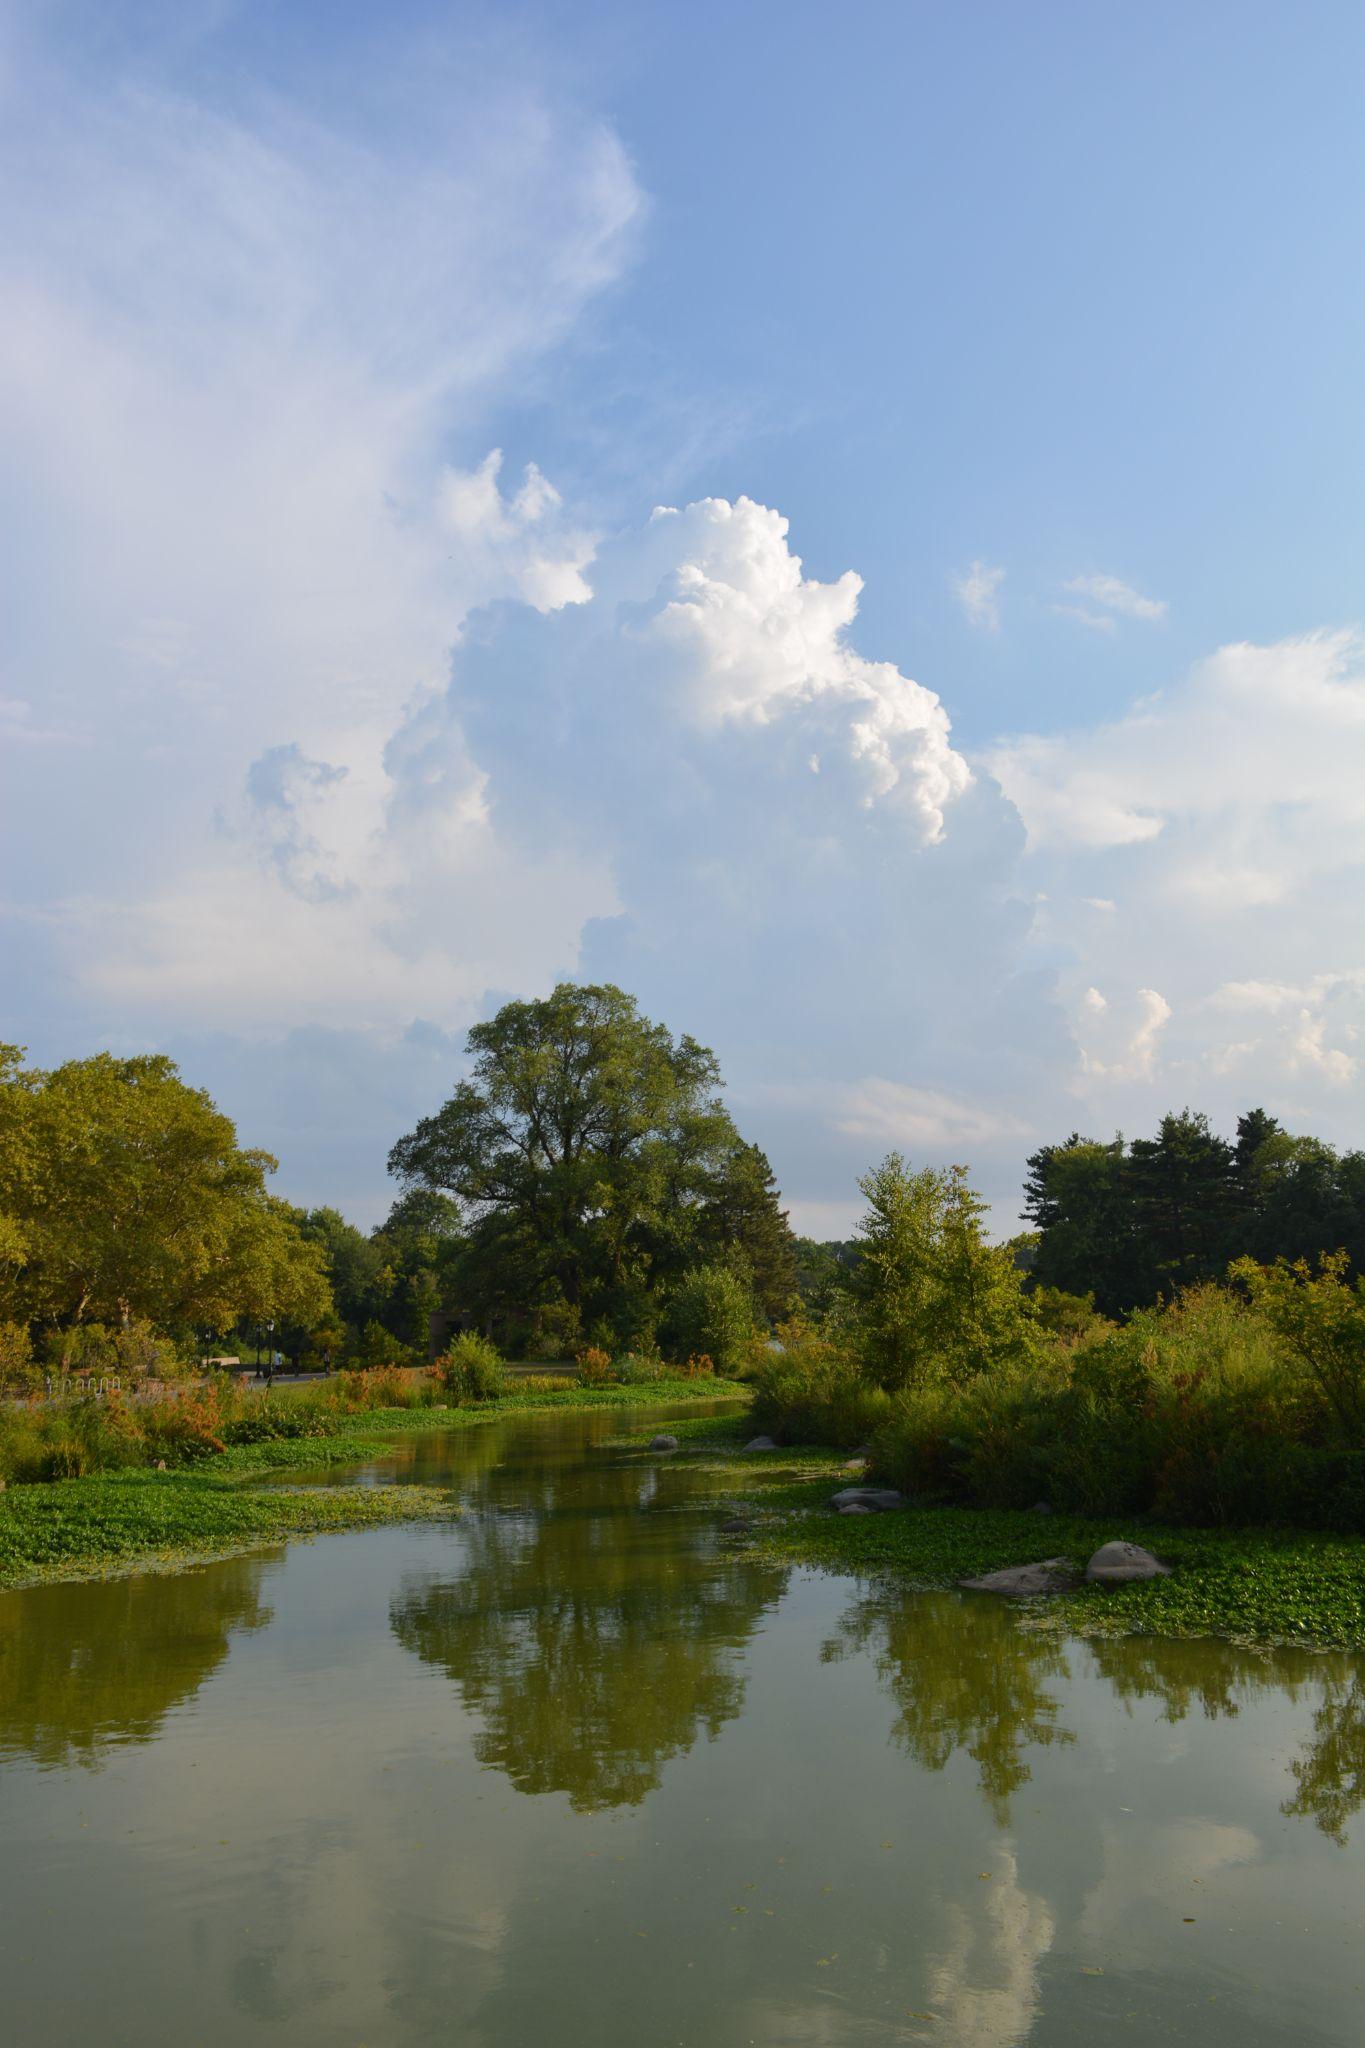 One wonderful afternoon in Prospect Park by Stefan Troberg